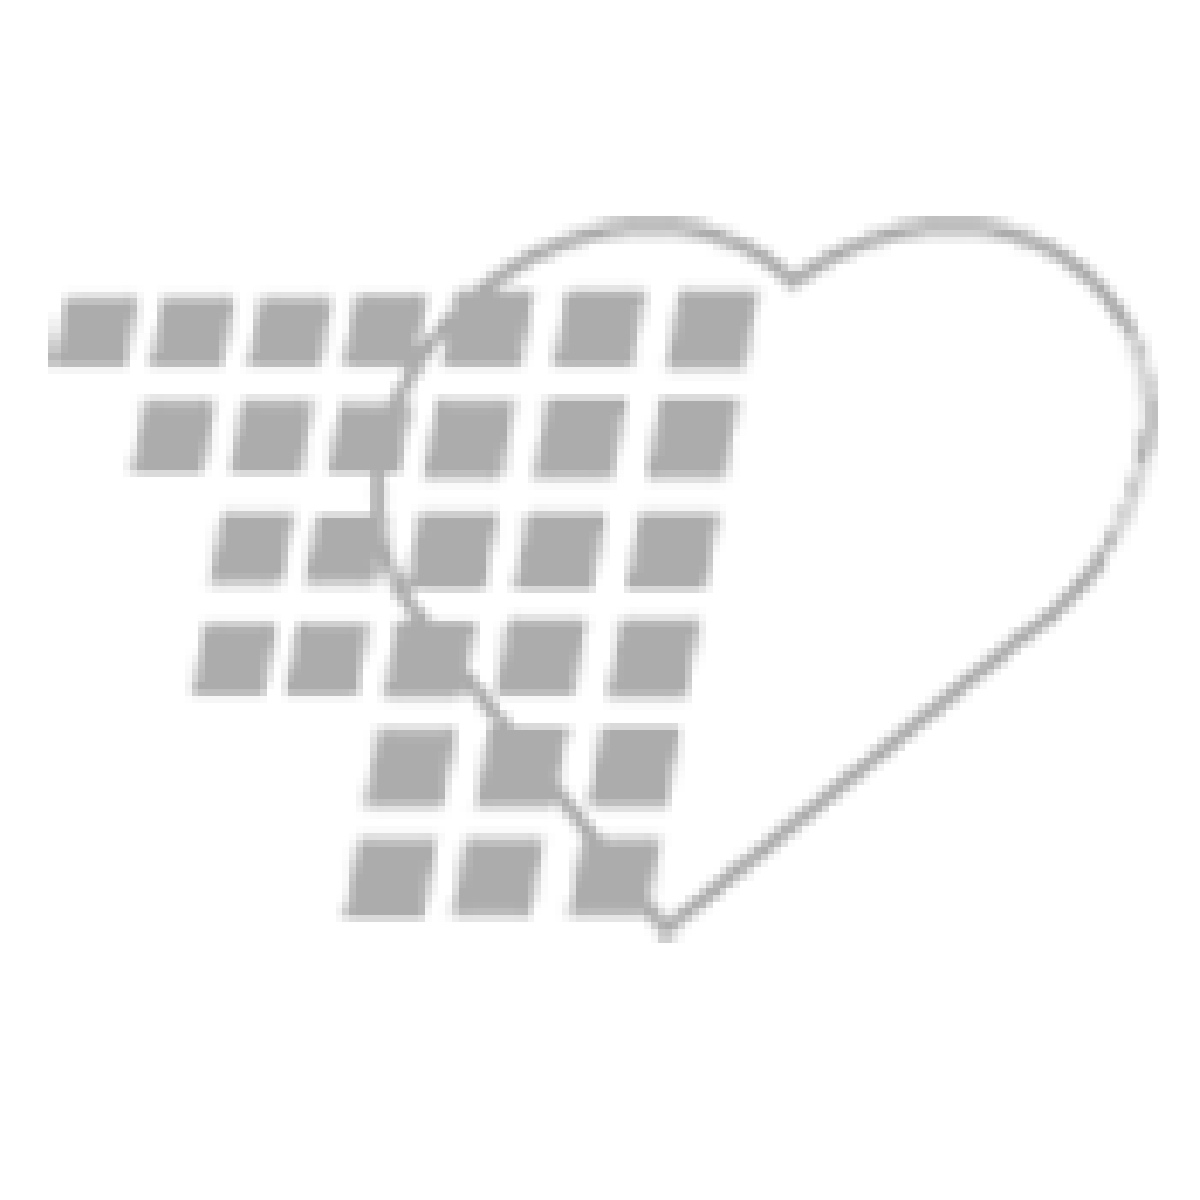 06-93-6931 Demo Dose® DiphenhydrAMIN Benadrl 50mg mL  1mL